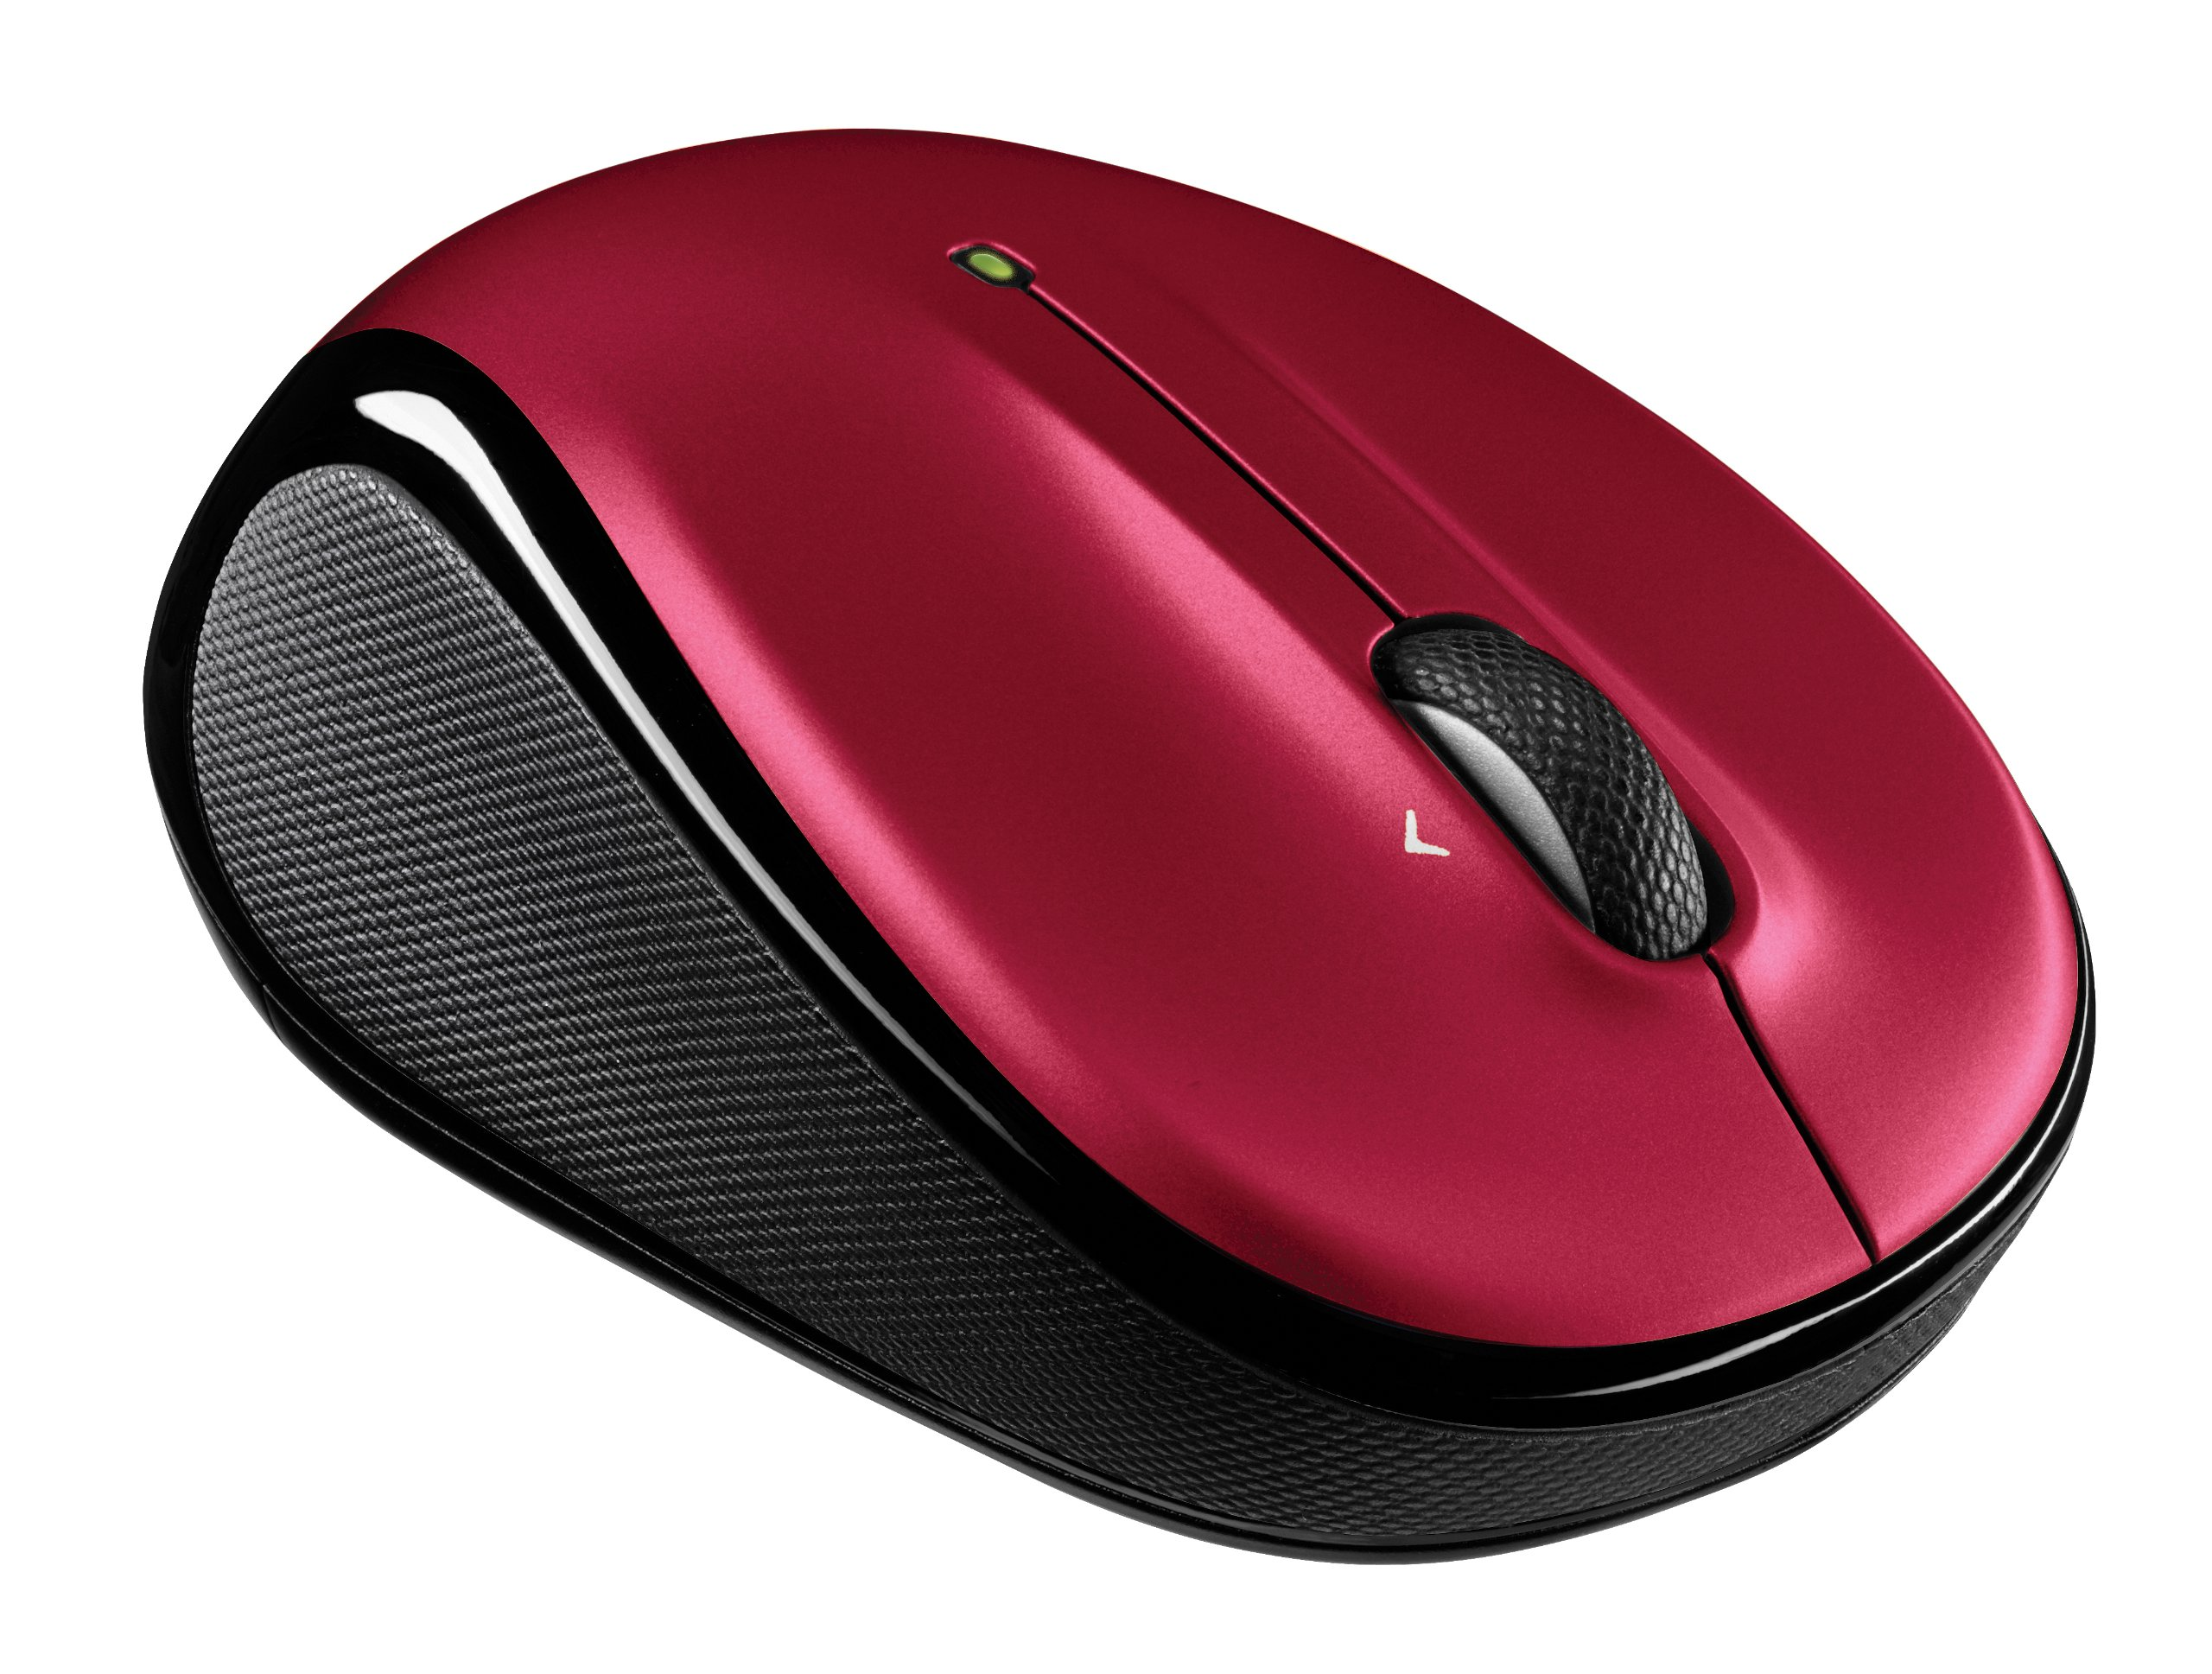 Logitech M Wireless Mouse With Designed For Web Scrolling Tweet Tweet